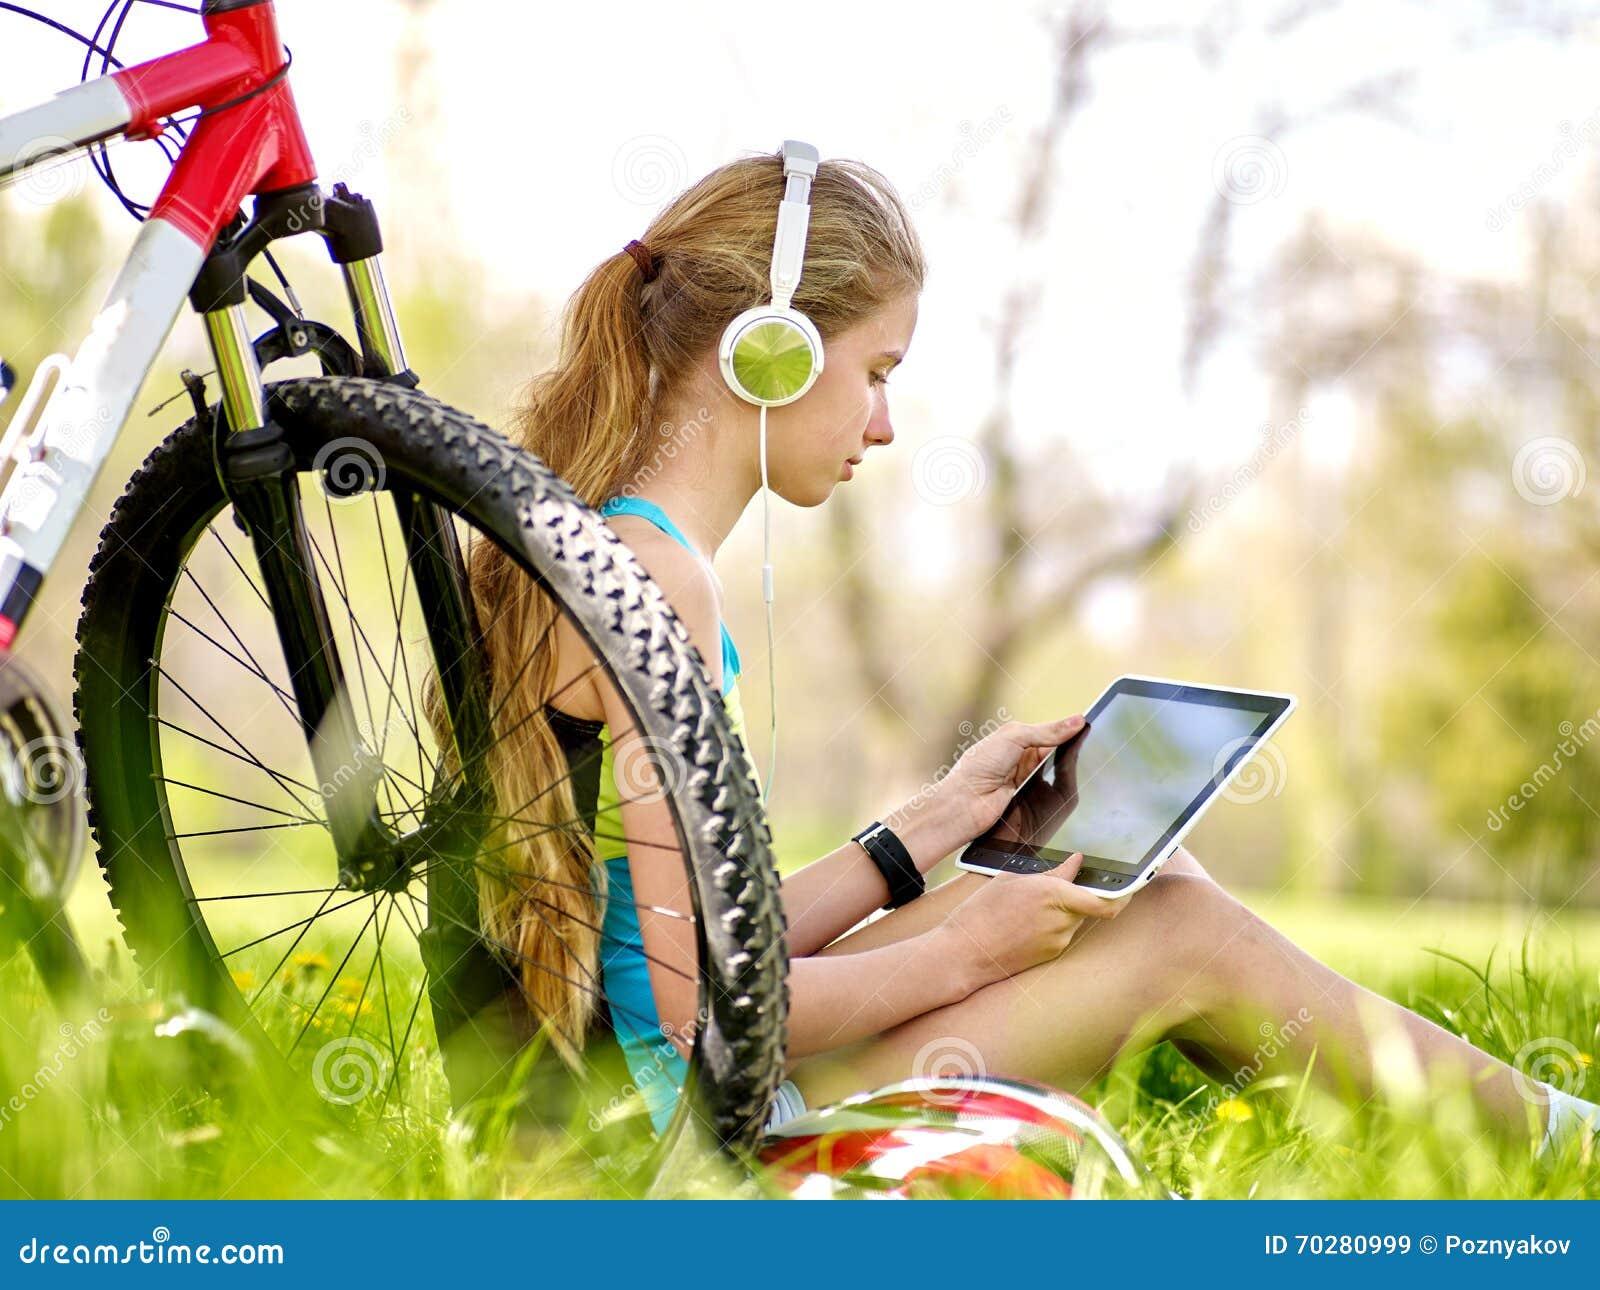 Bikes Cycling Girl Wearing Helmet Rides Bicycle. Royalty ...